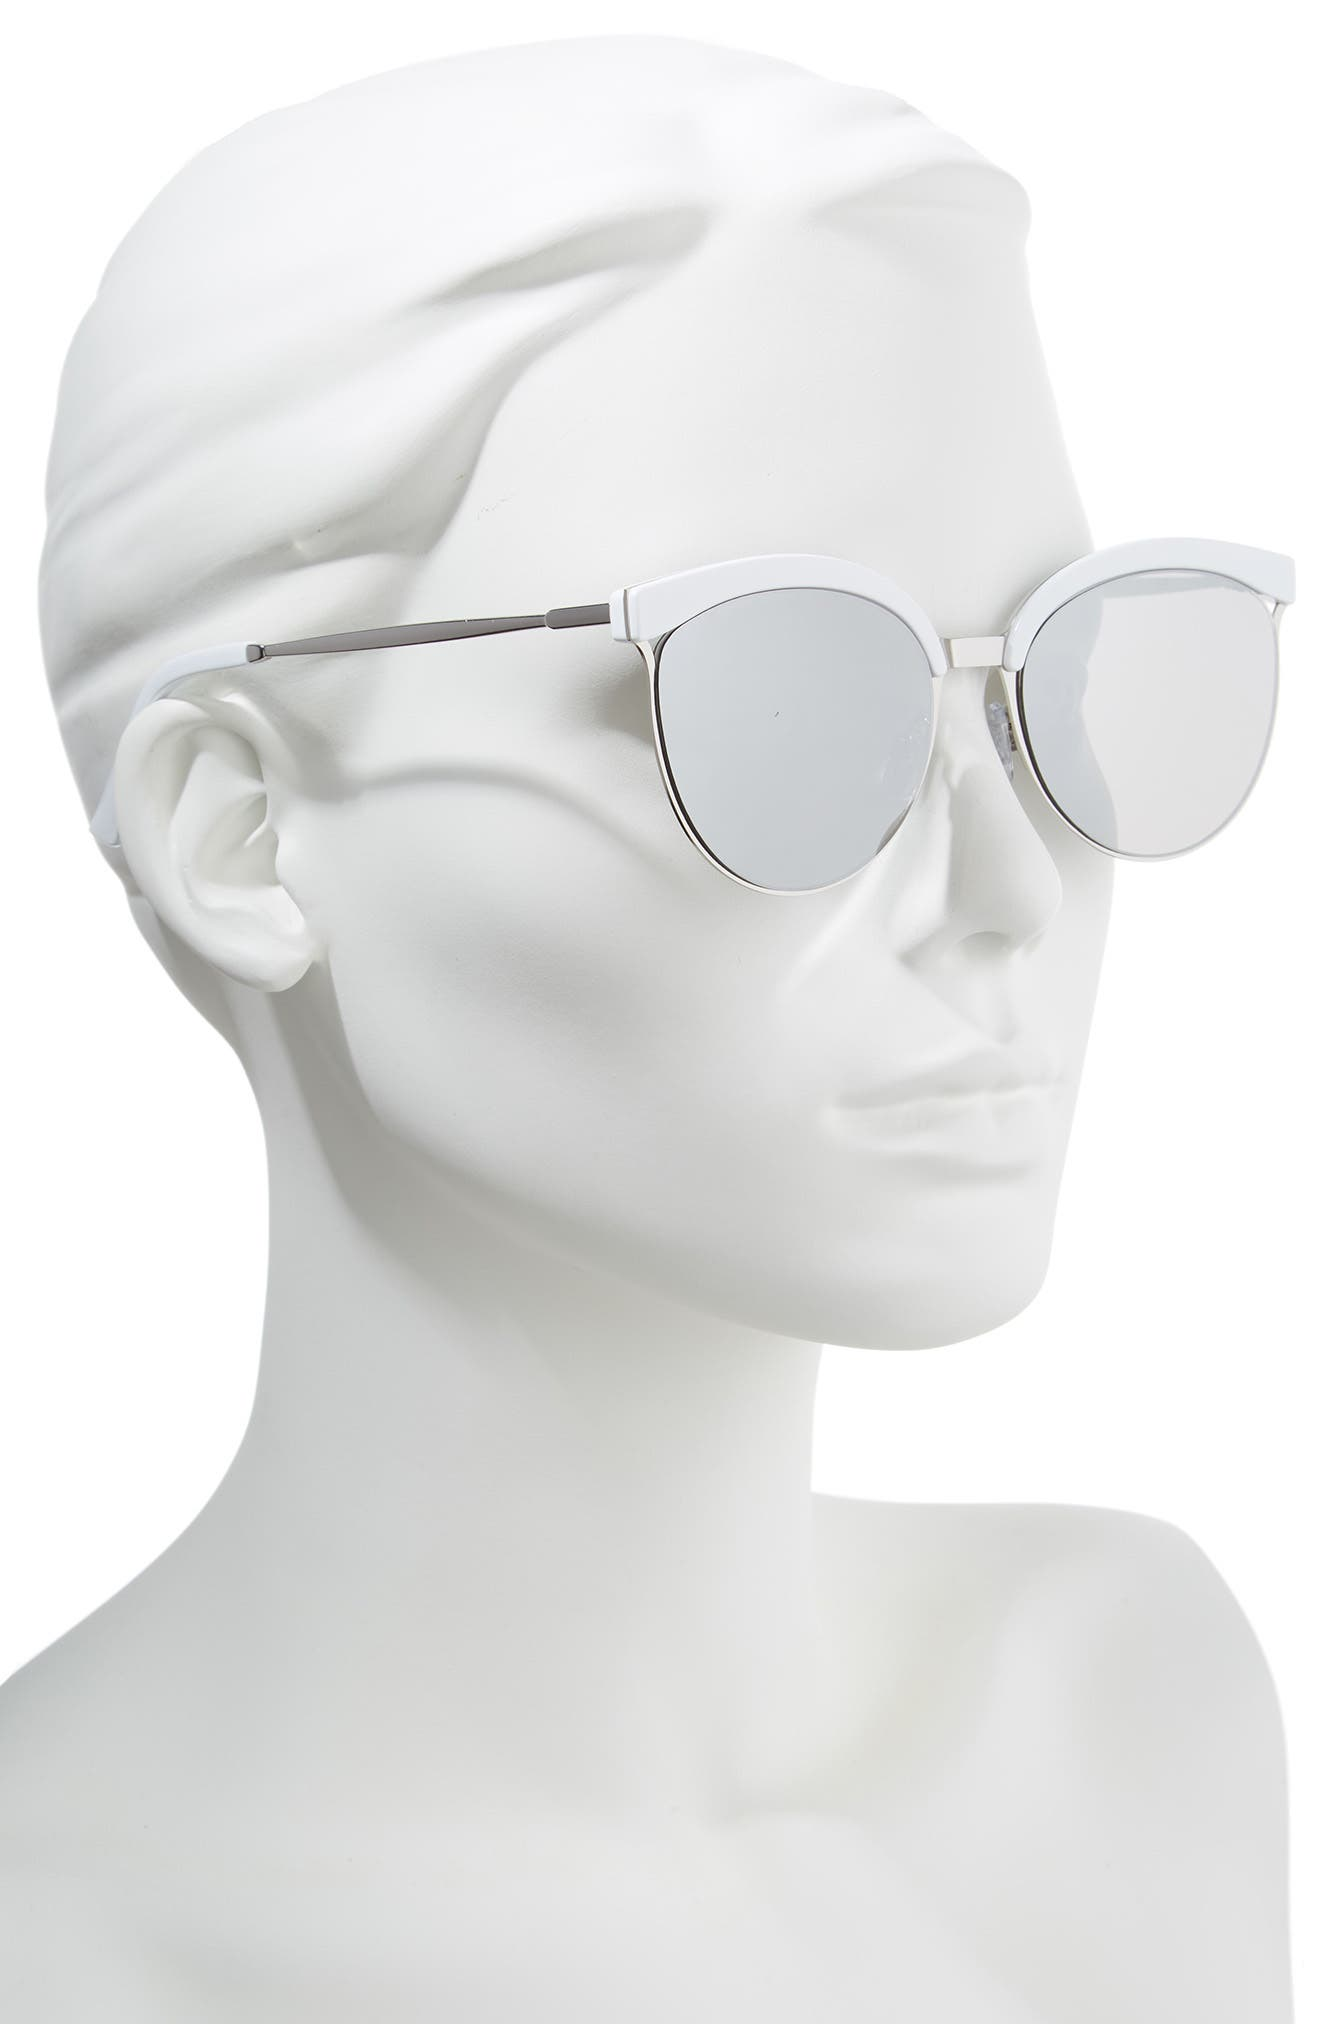 57mm Round Sunglasses,                             Alternate thumbnail 2, color,                             100